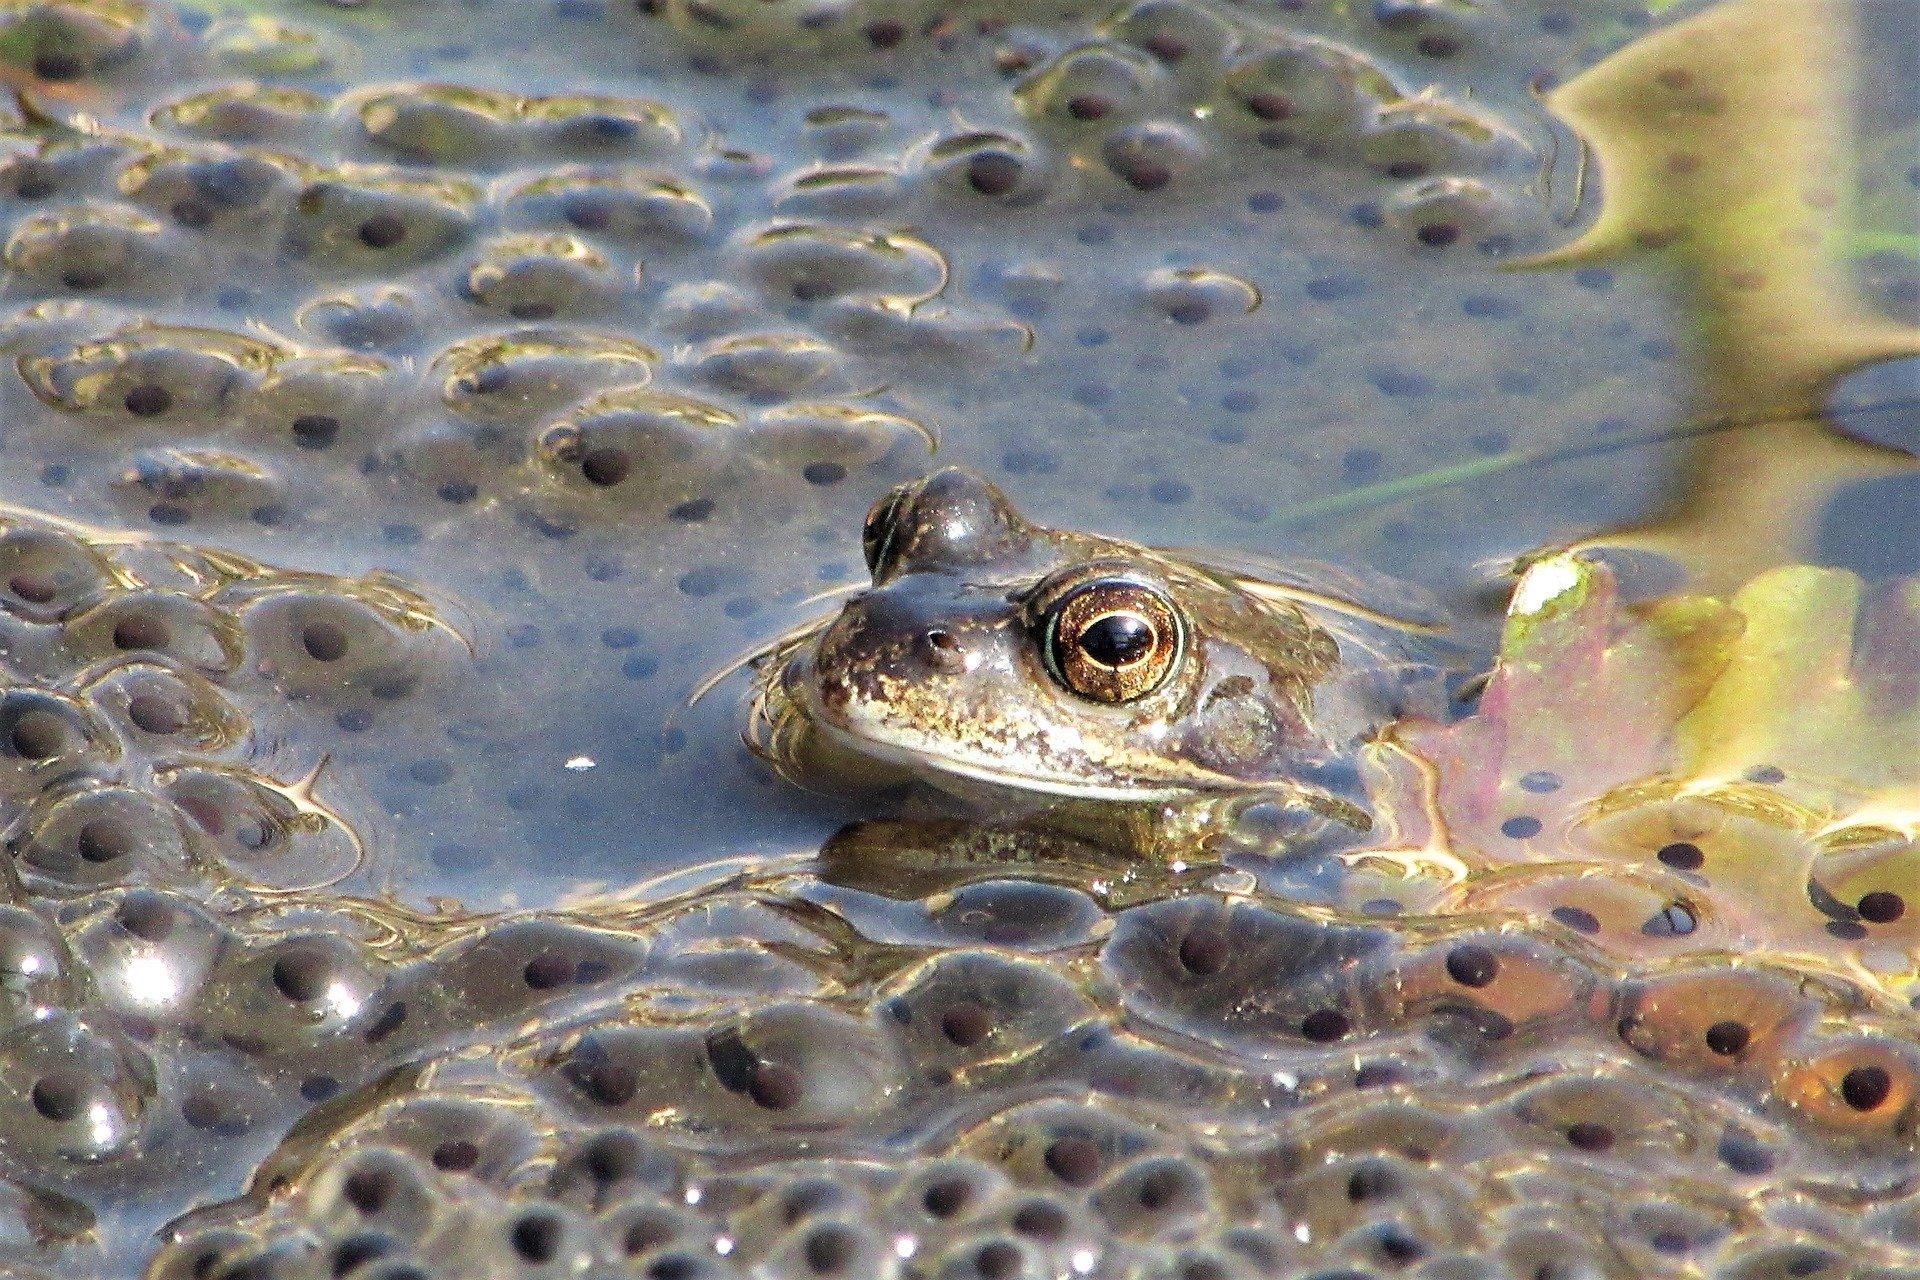 frog-4100874_1920.jpg